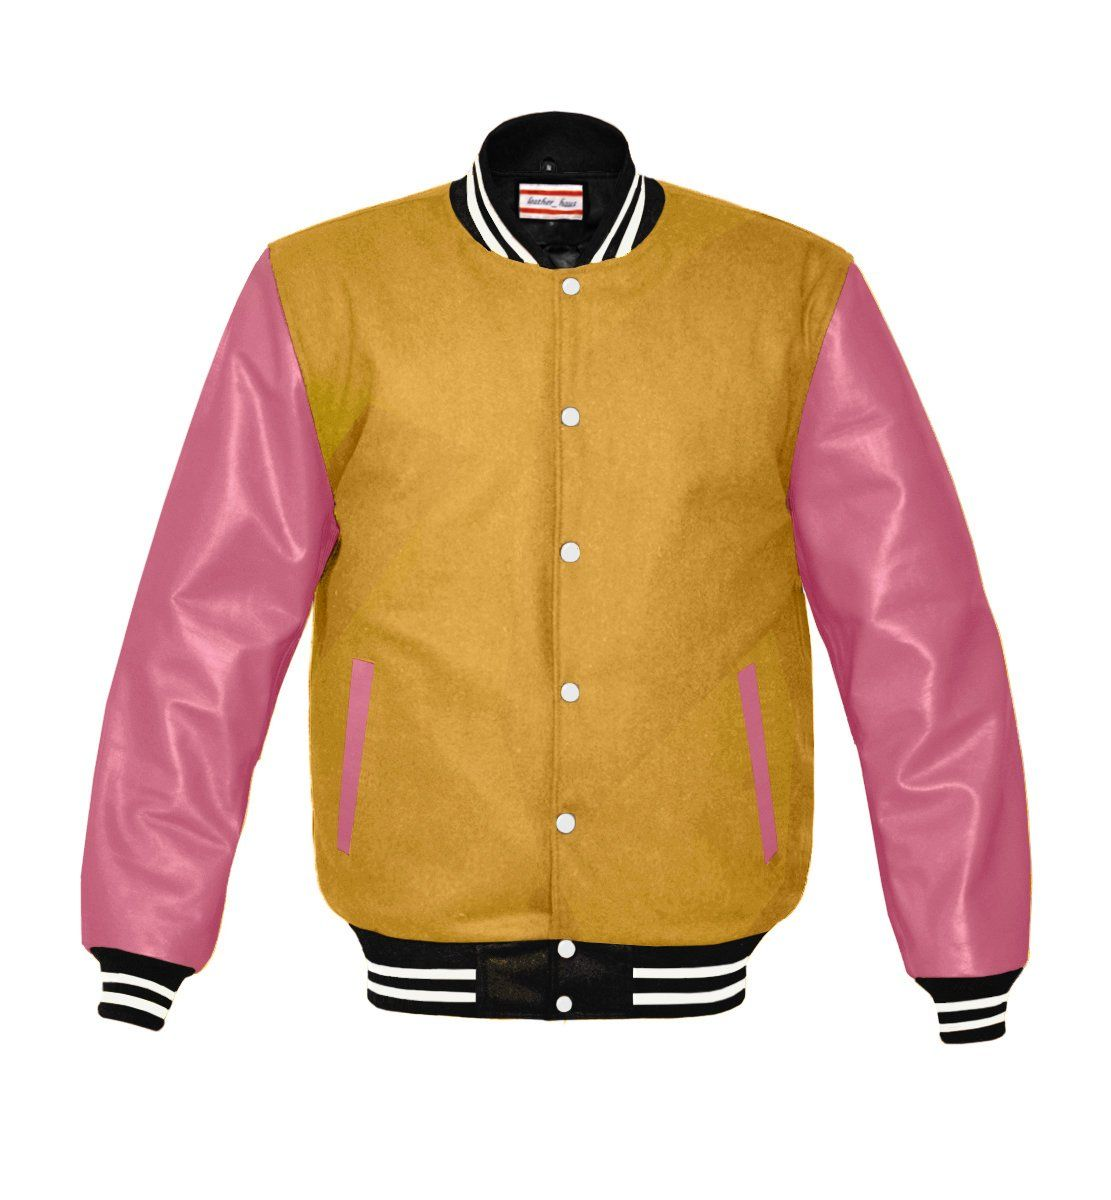 luvsecretlingerie Superb Genuine Yellow Leather Sleeve Letterman College Varsity Kid Wool Jackets